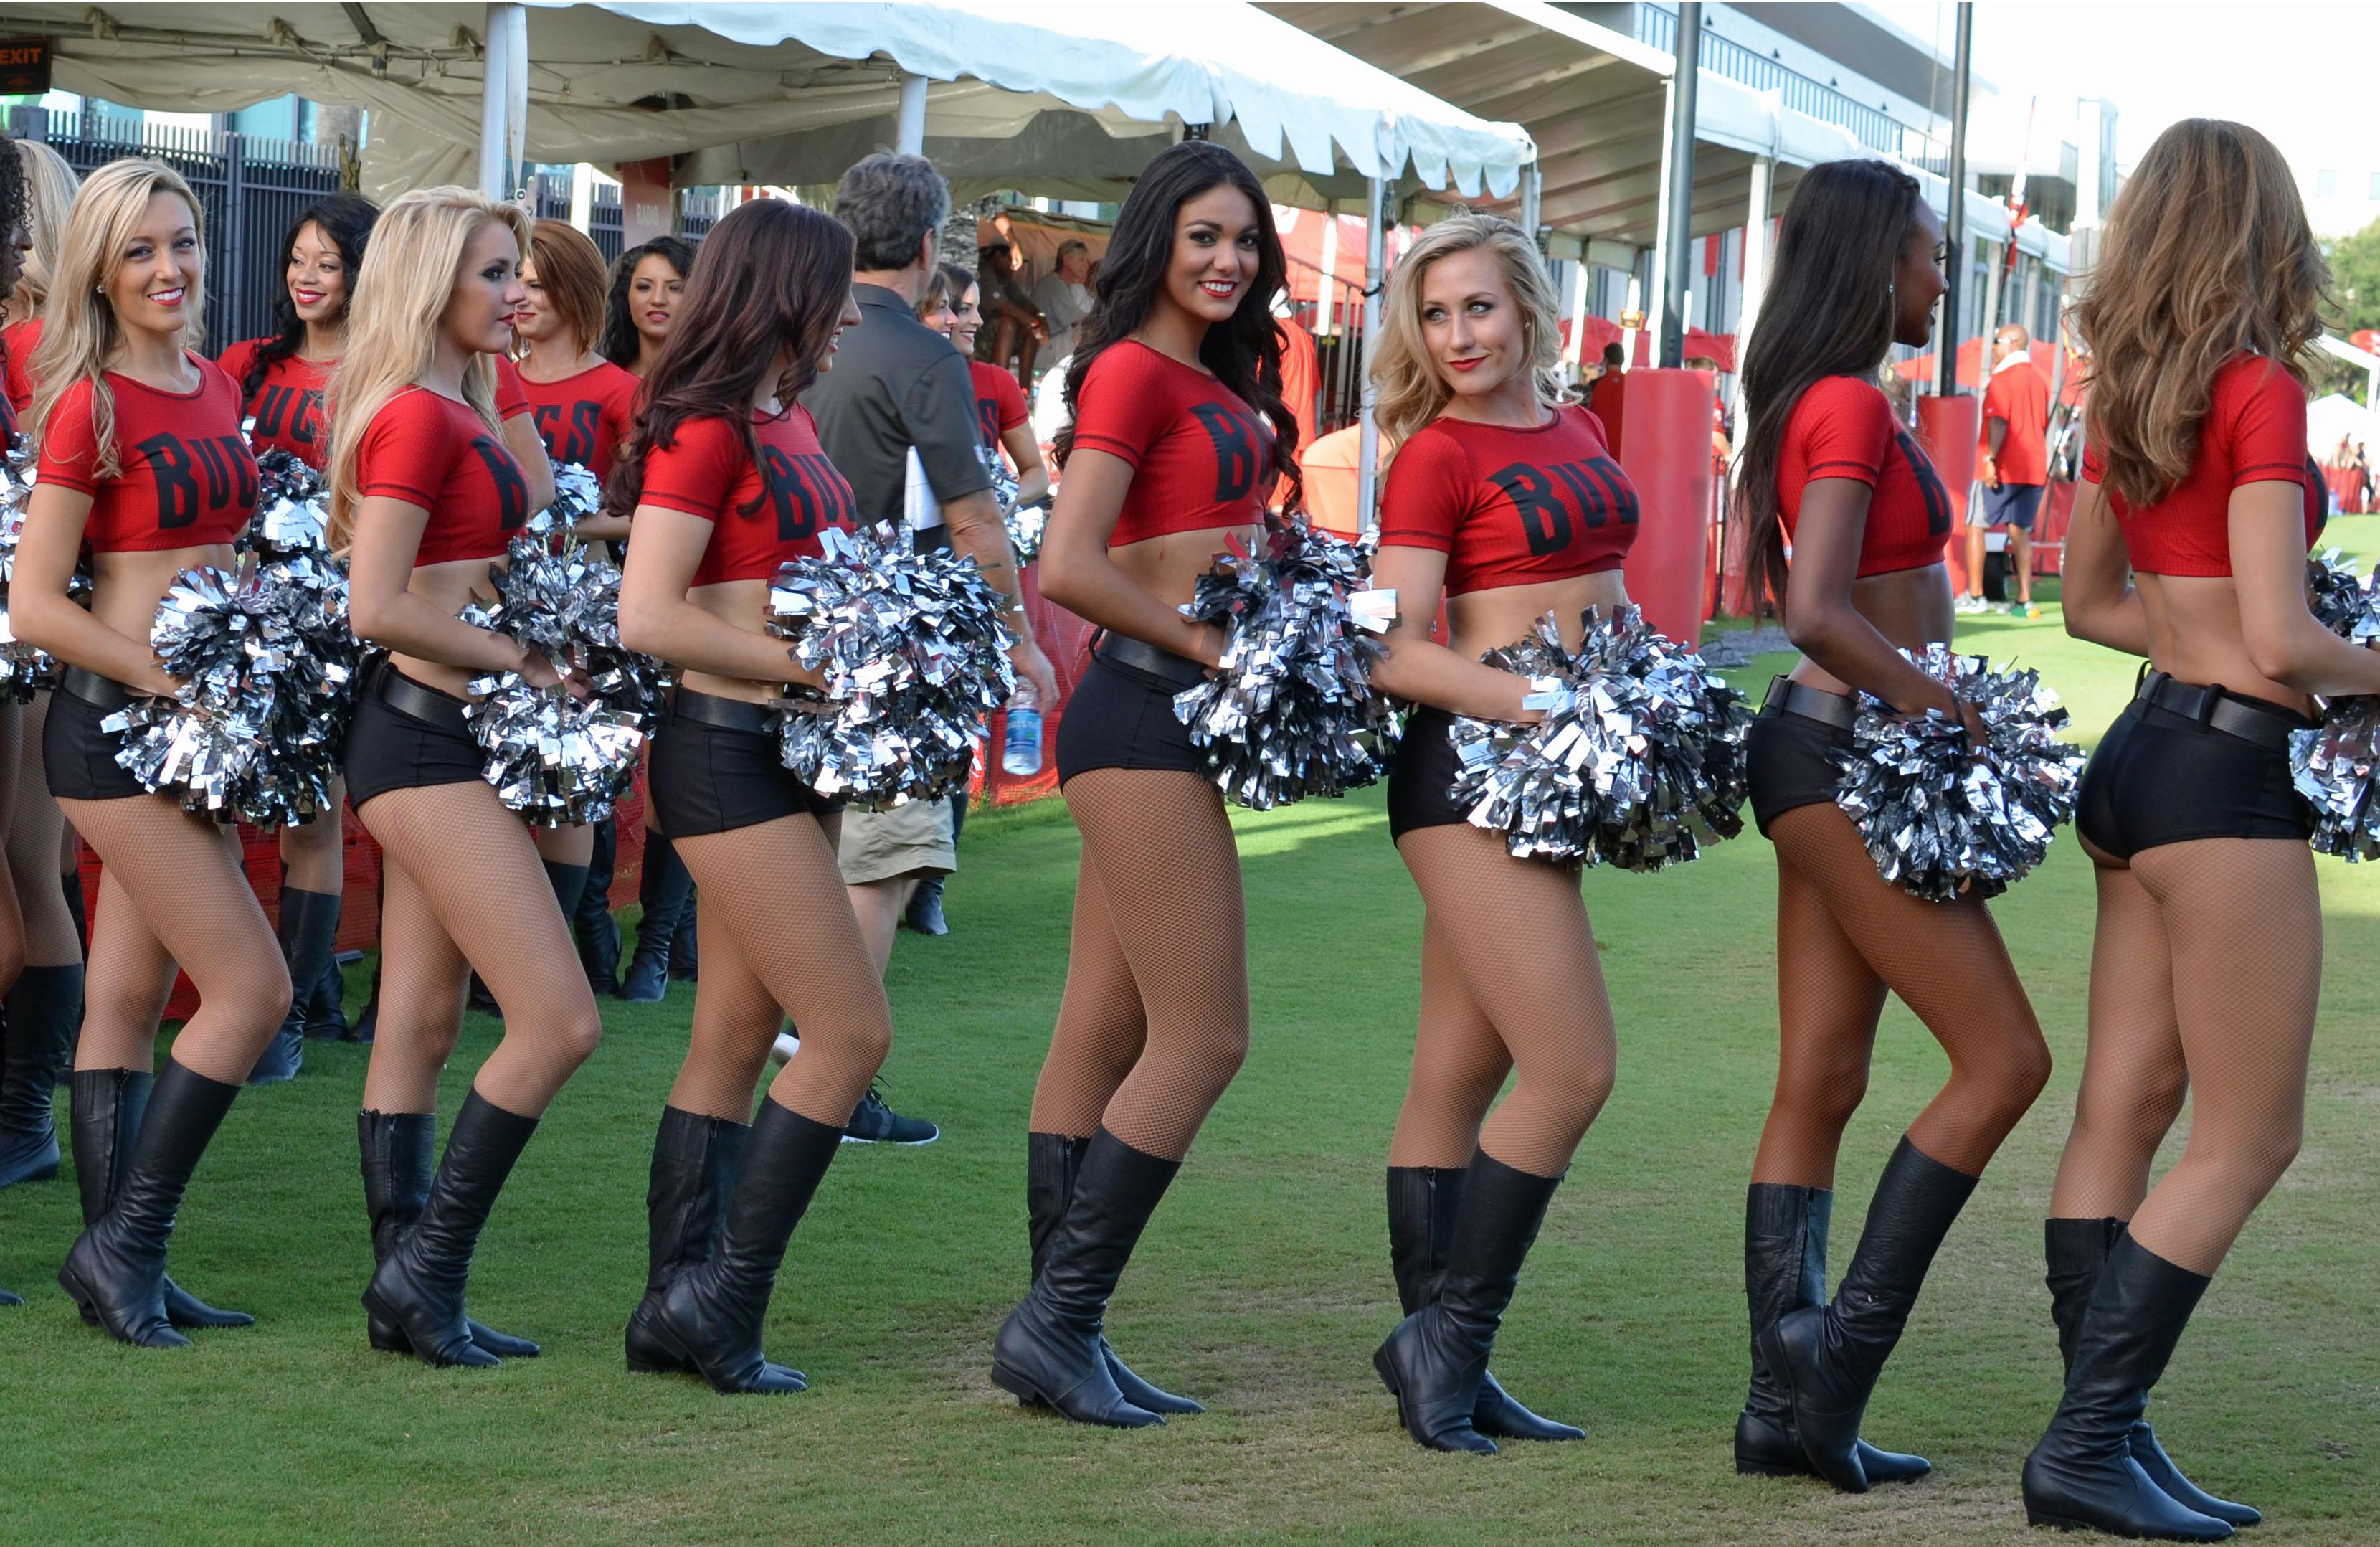 file tampa bay buccaneers cheerleading squad jpg wikimedia commons https commons wikimedia org wiki file tampa bay buccaneers cheerleading squad jpg